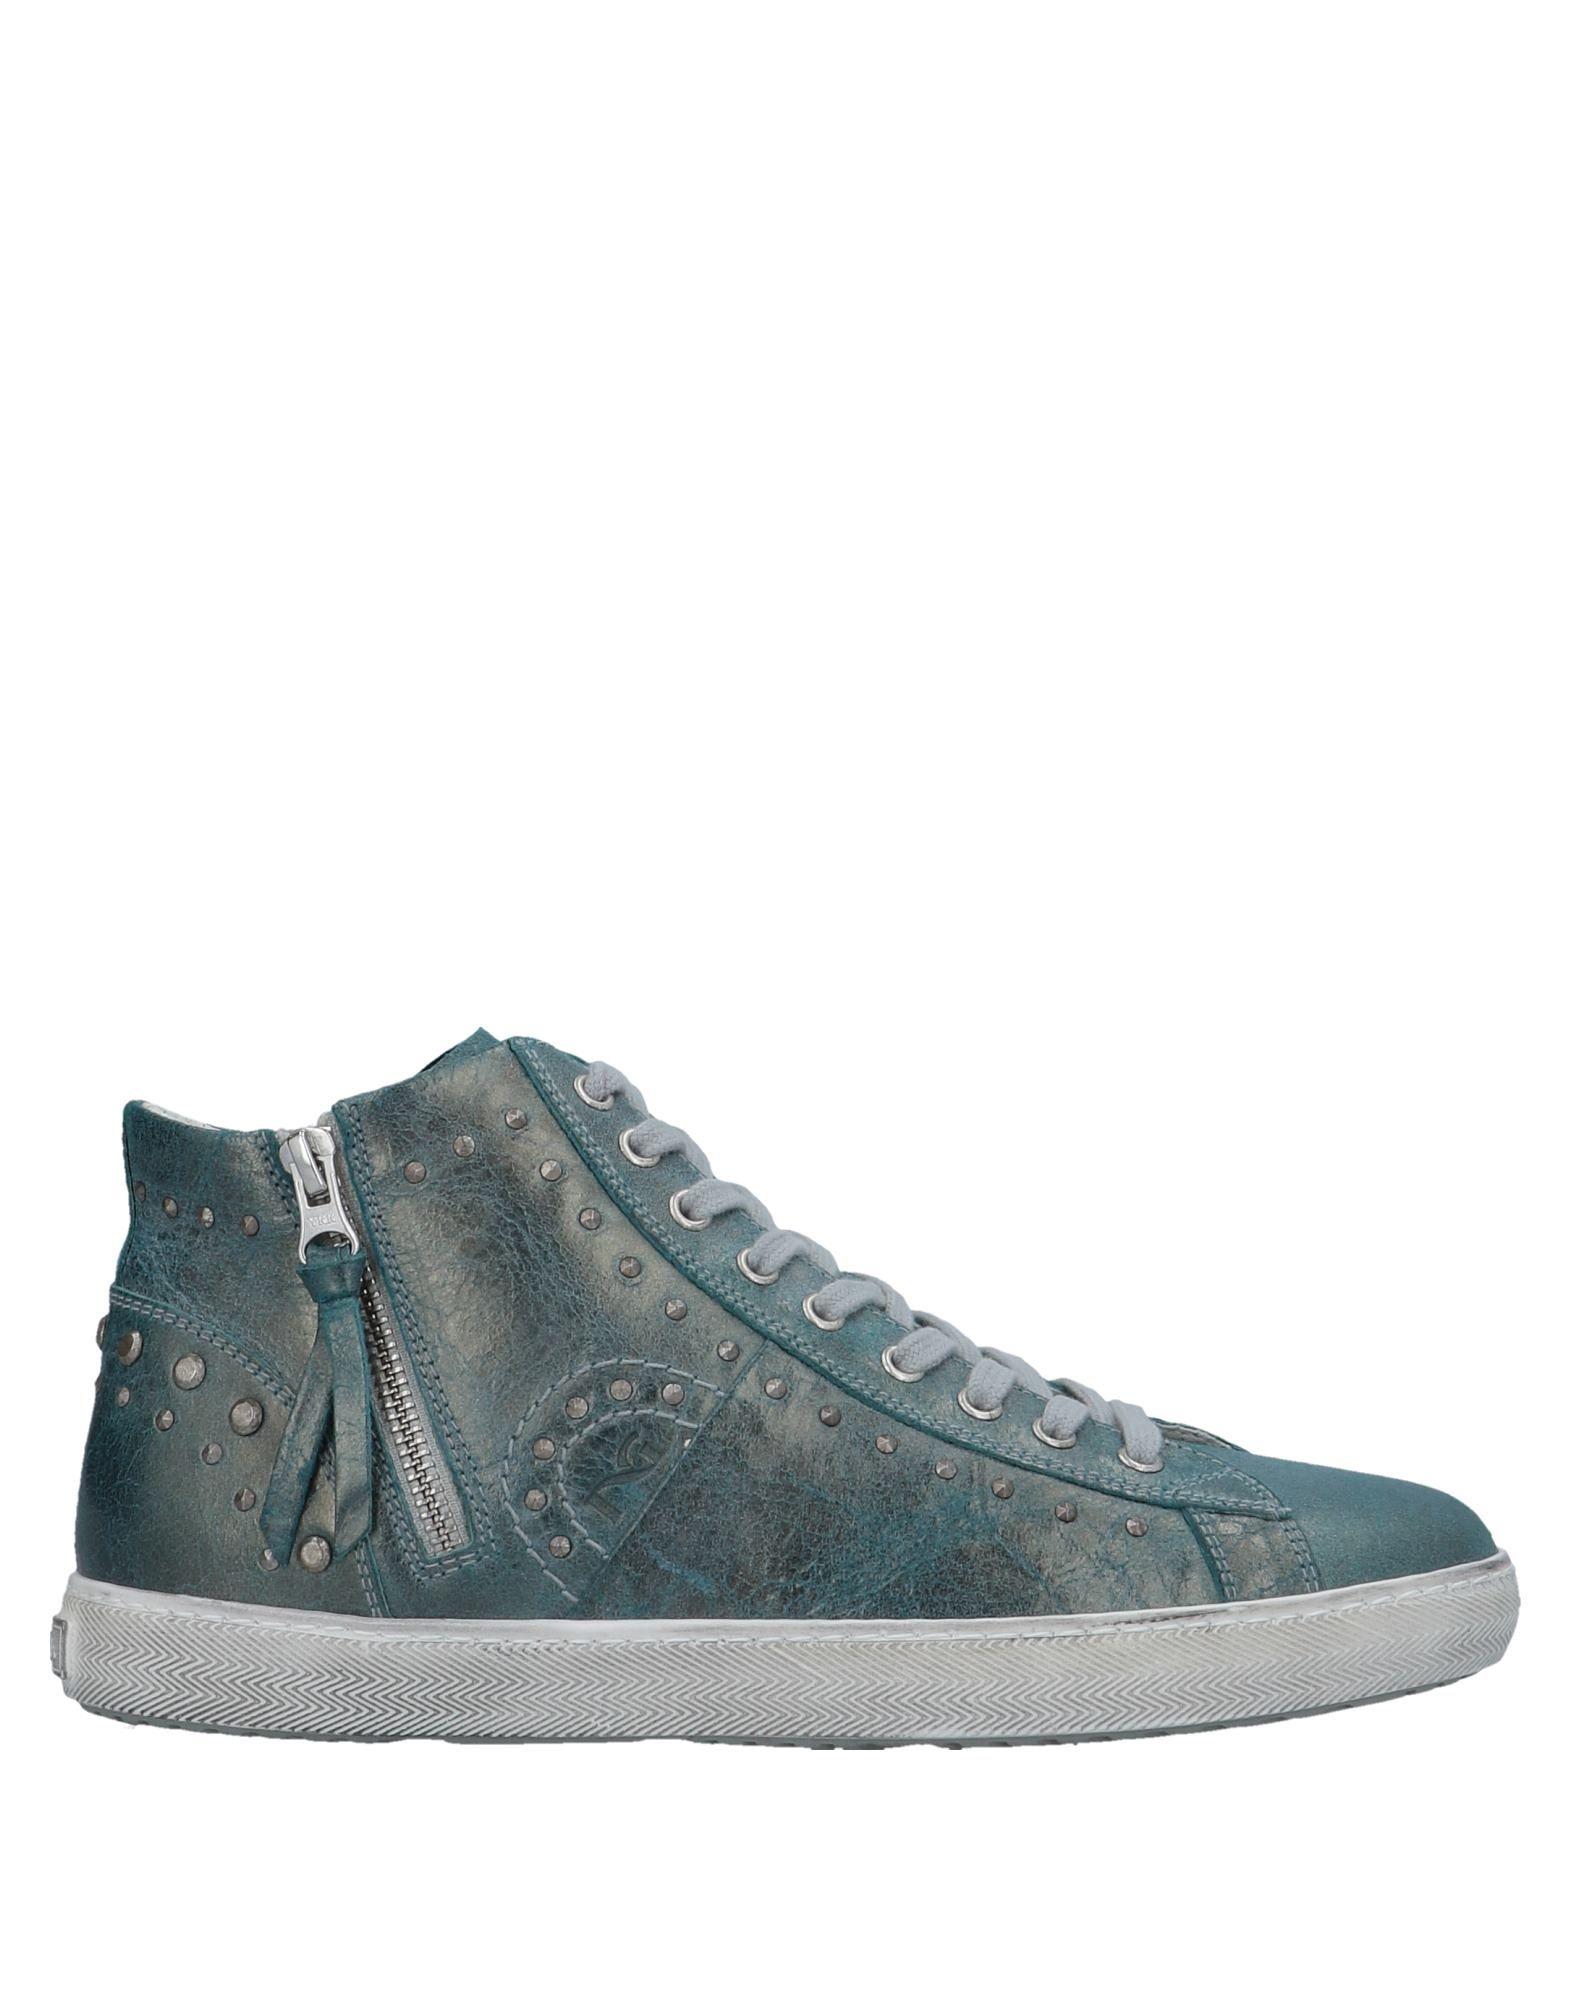 Nero Giardini Sneakers Damen  11537683IE Gute Qualität beliebte Schuhe